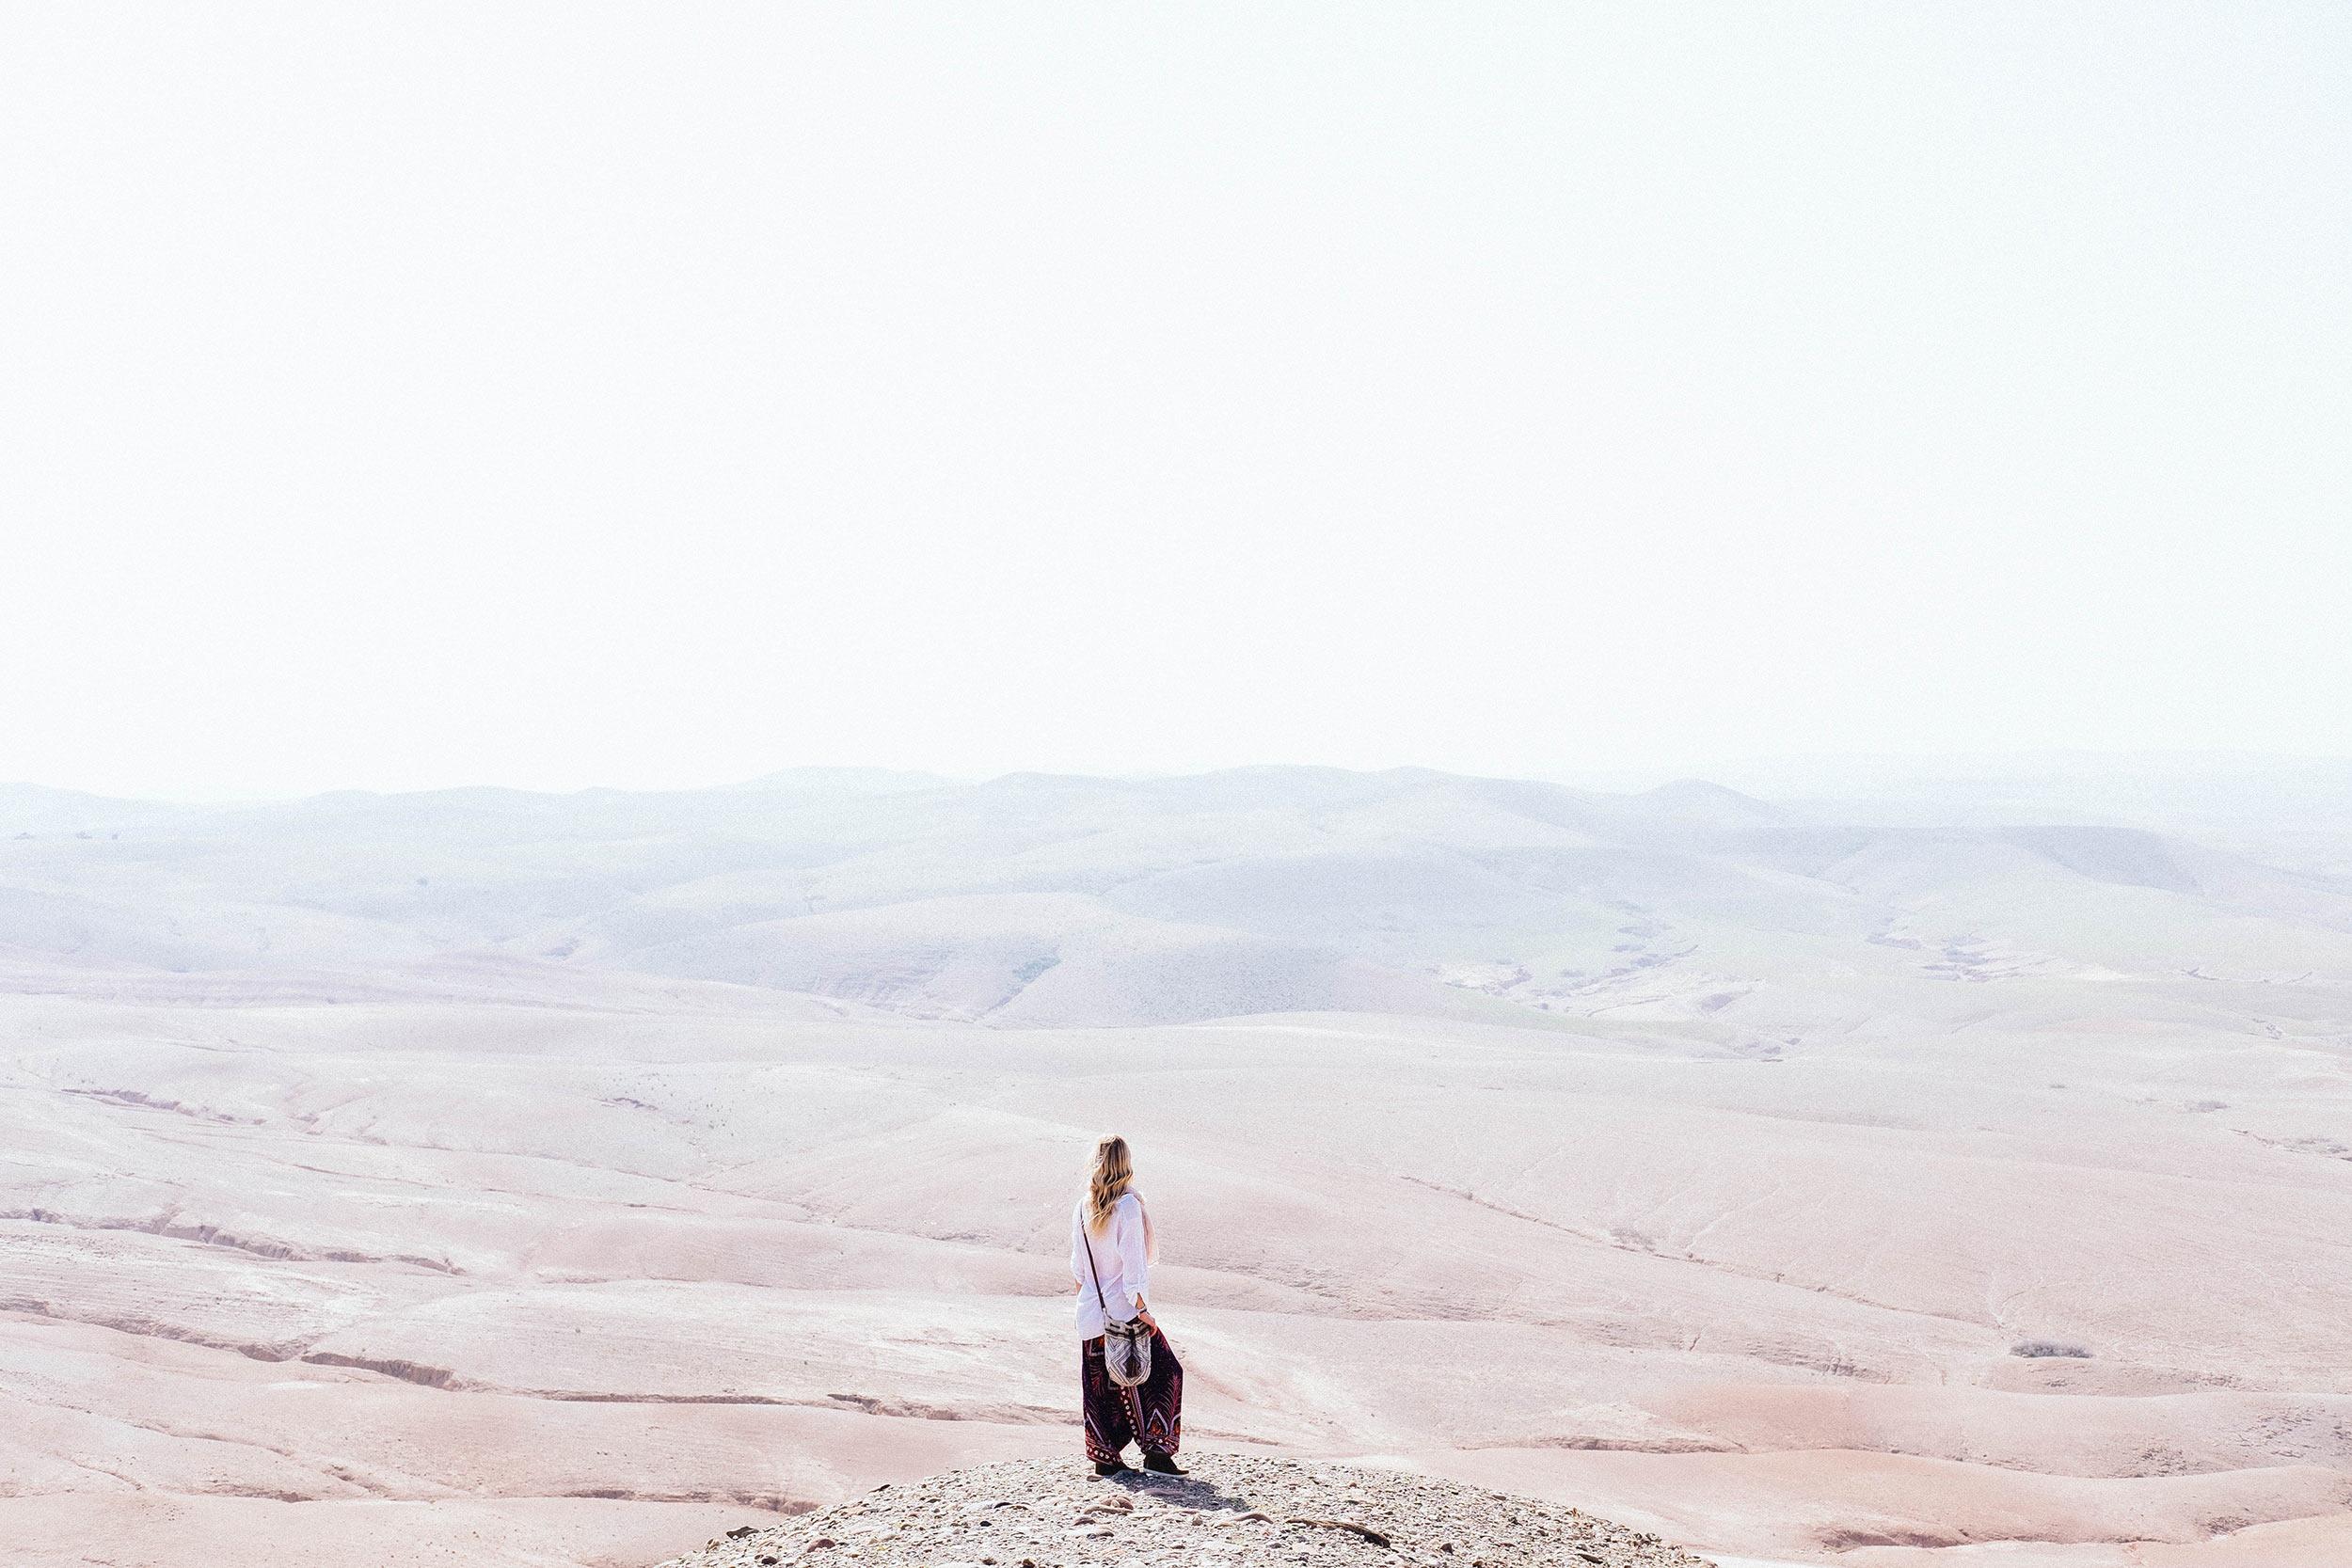 Morocco-6066.jpg